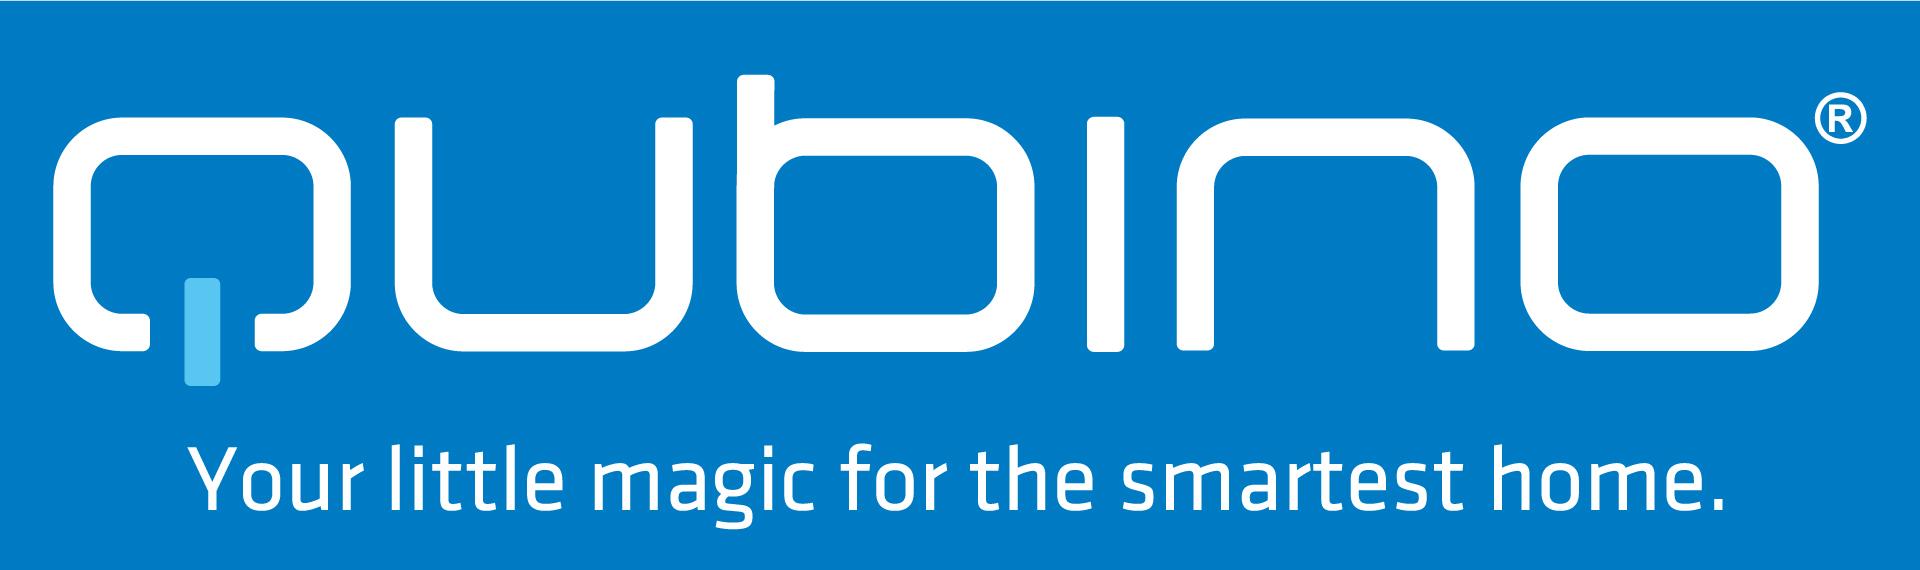 Qubino-logo-blue-01.jpg